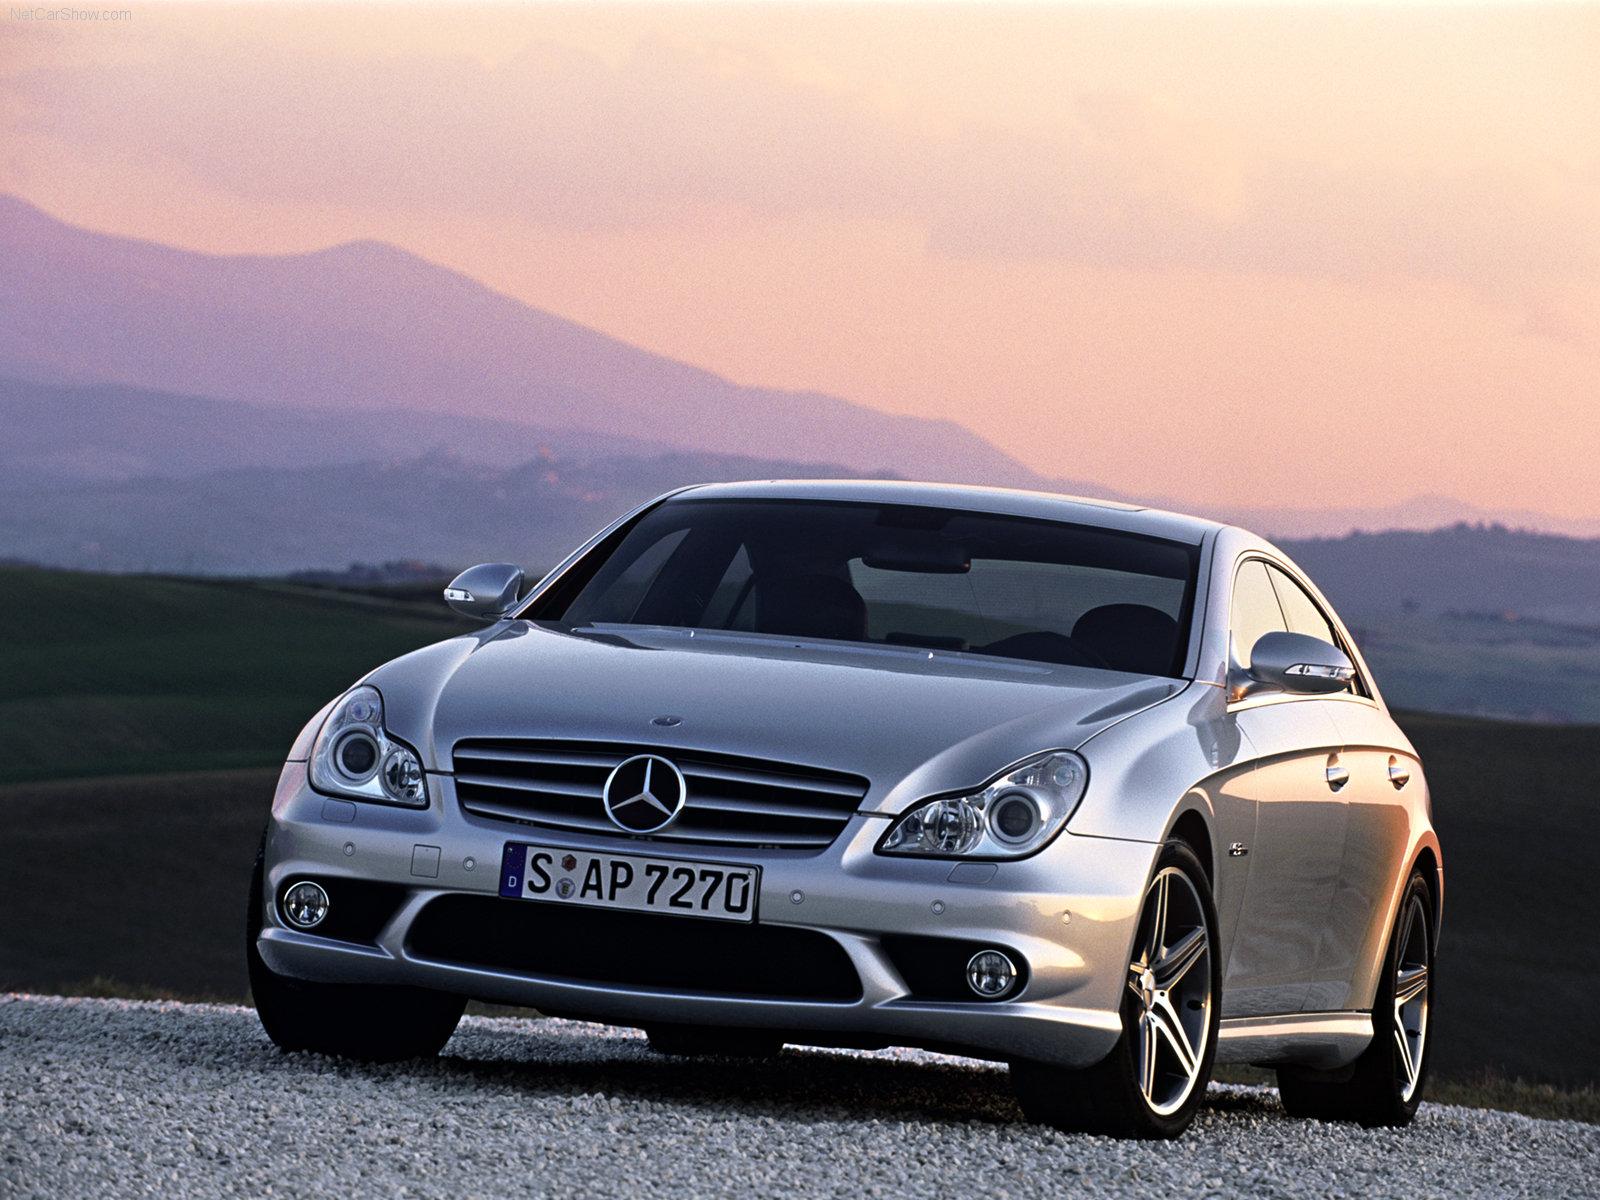 Mercedes Benz Wallpapers HD Nice Wallpapers 1600x1200